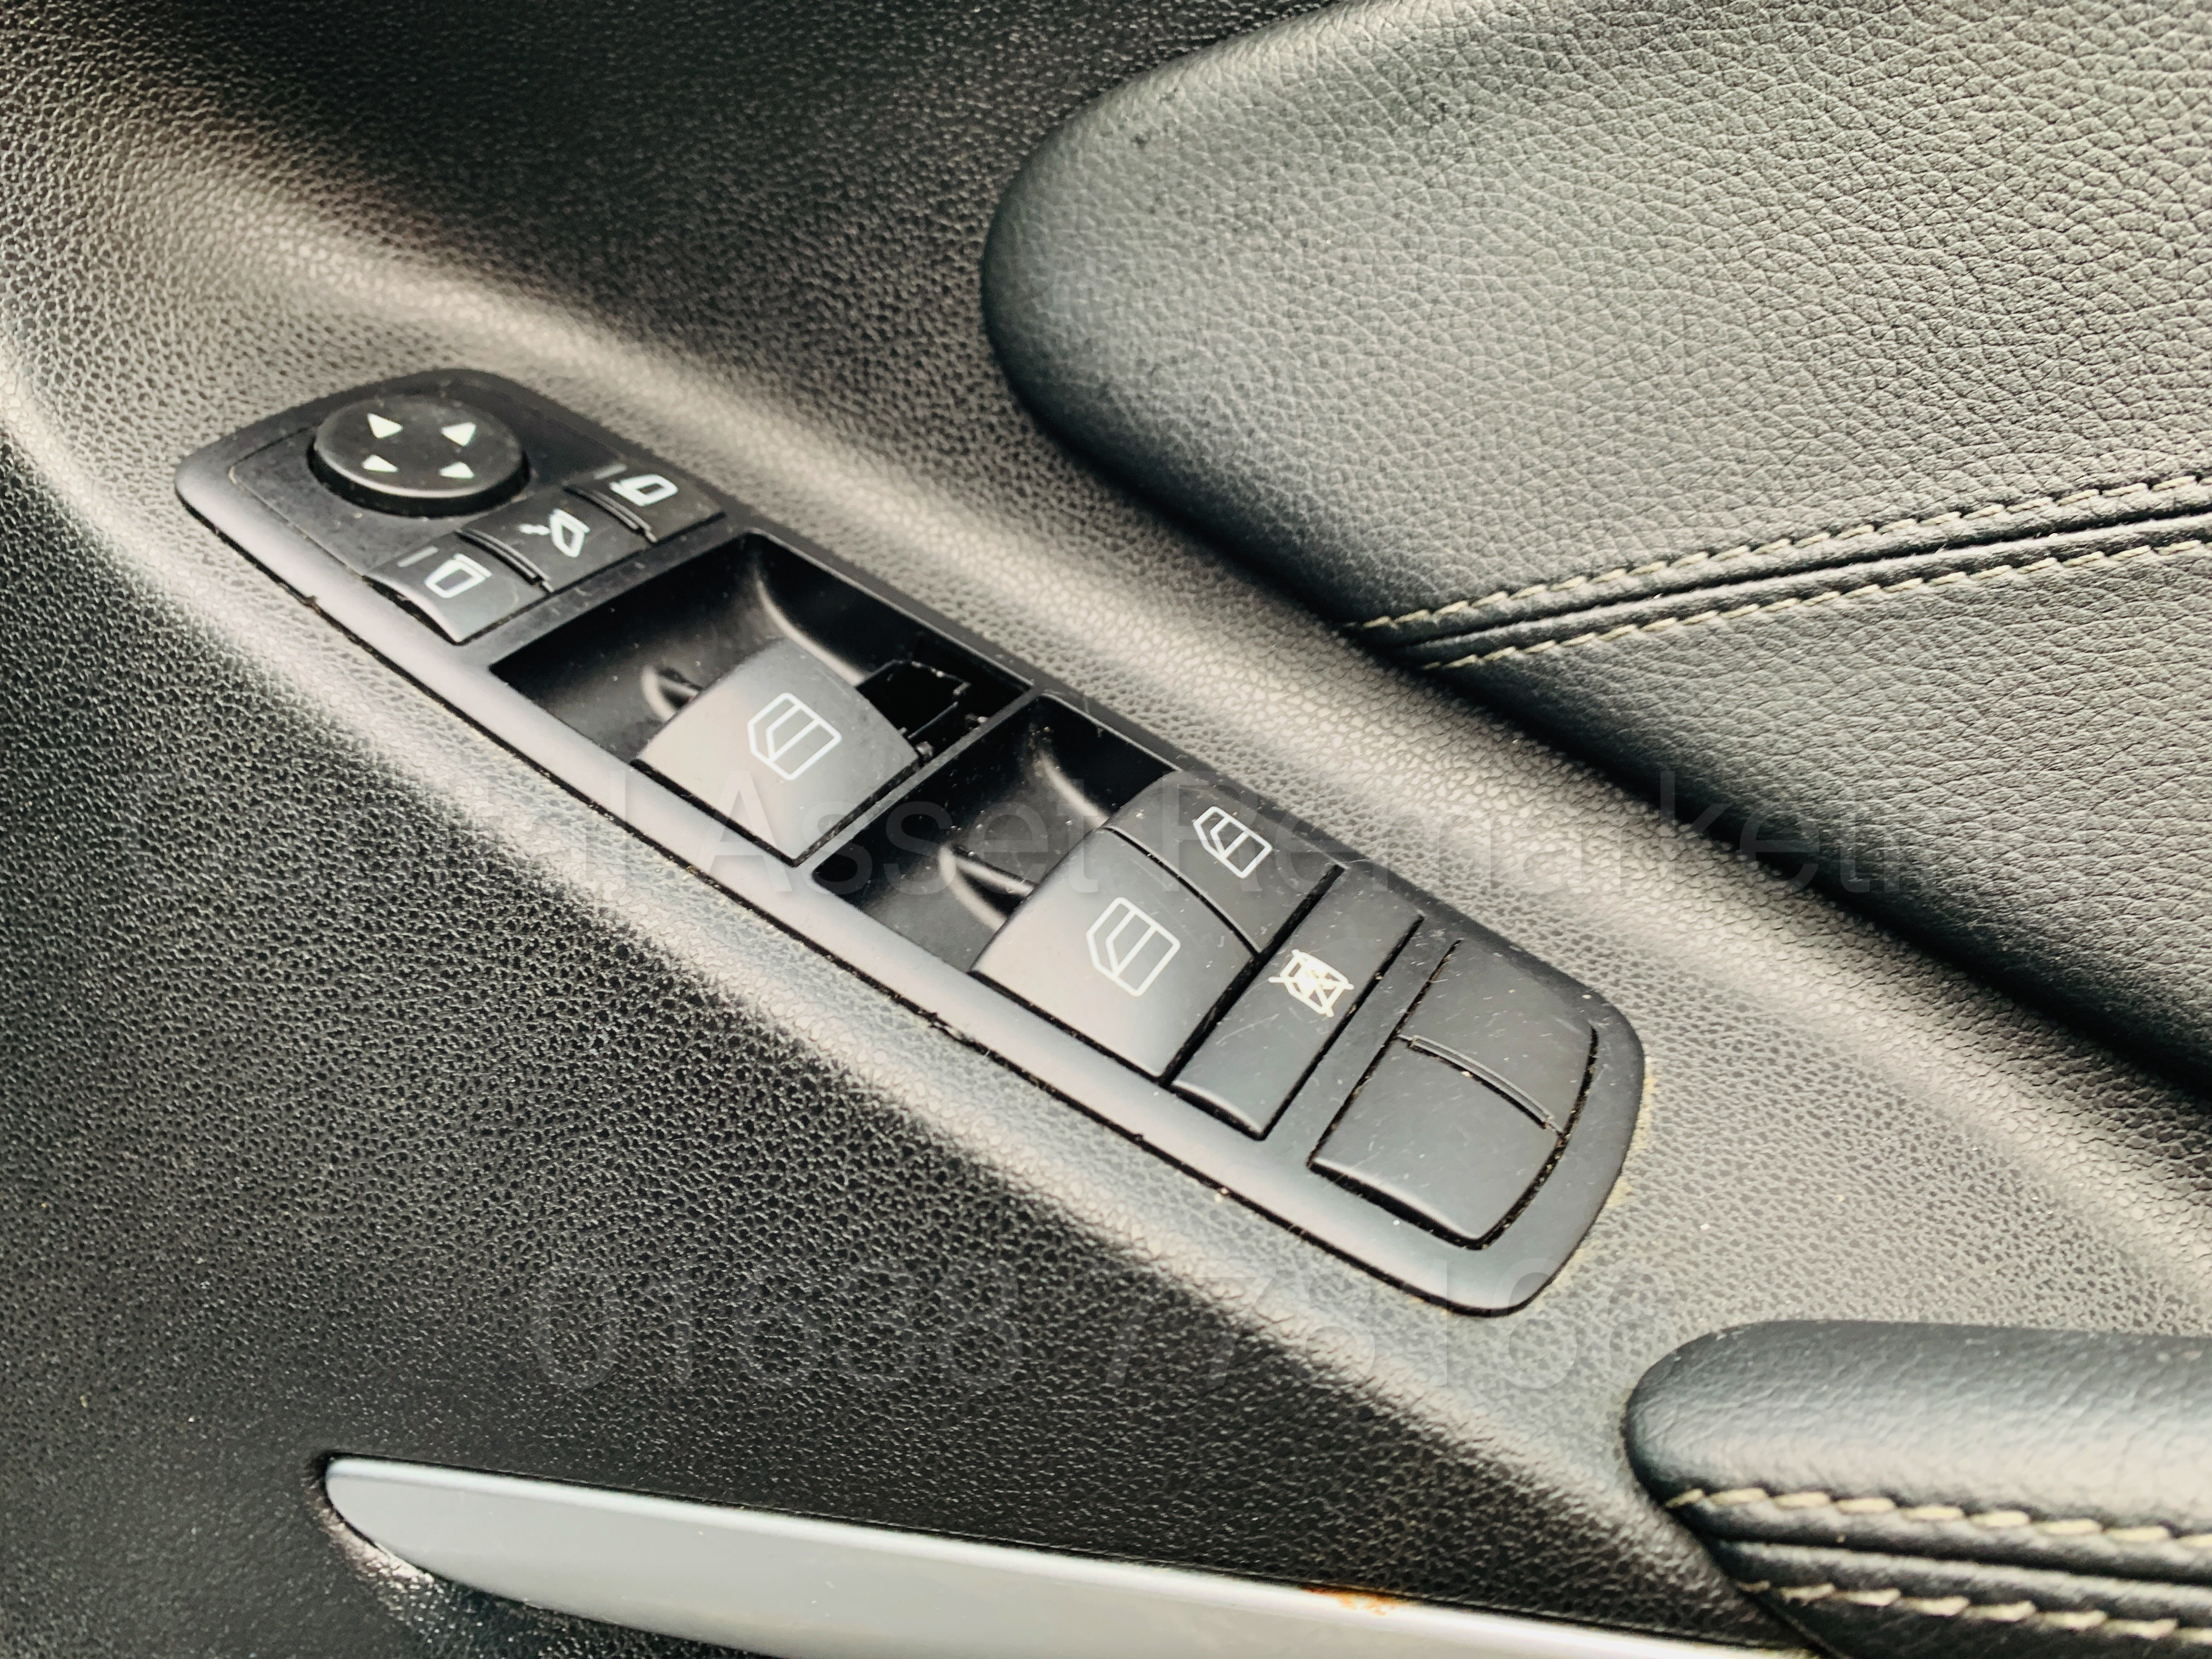 Lot 19 - MERCEDES-BENZ ML 350 CDI *SPORT* (2011 MODEL) '3.0 DIESEL - 231 BHP - AUTO' **TOP OF THE RANGE**